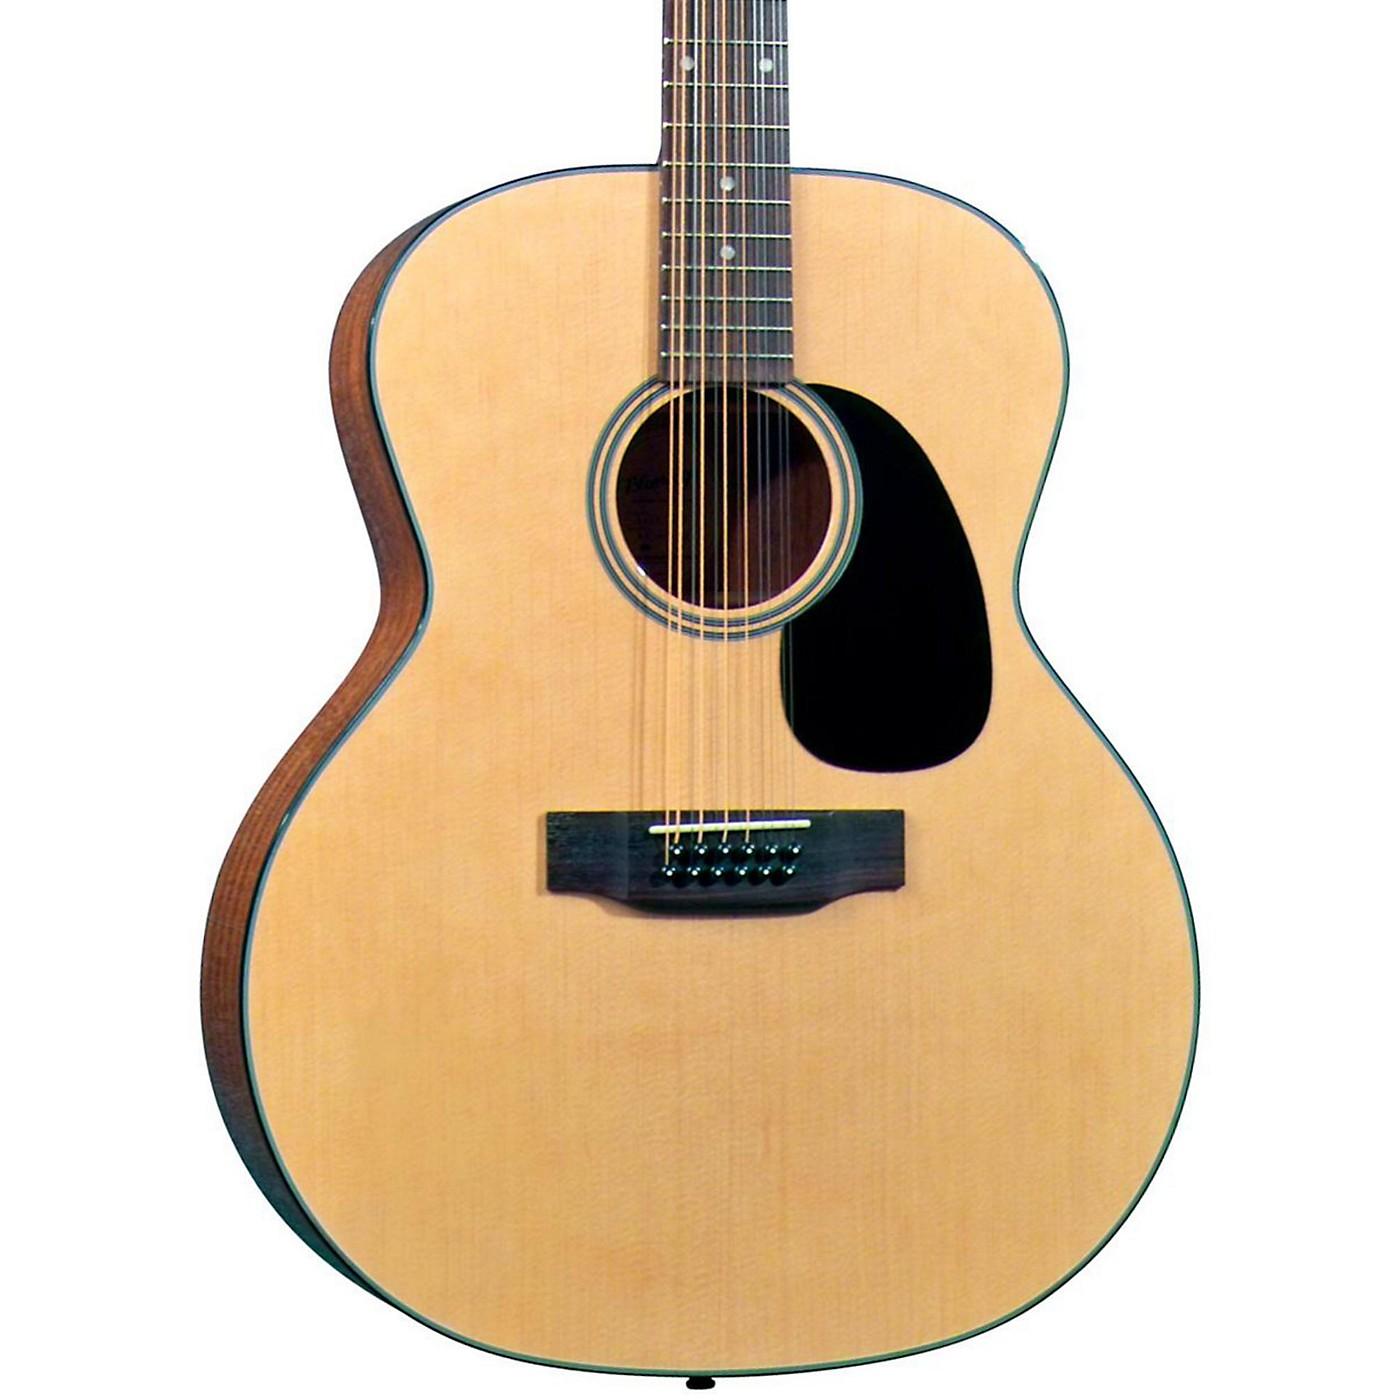 Blueridge Contemporary Series BR-40-12 12-String Jumbo Acoustic Guitar thumbnail